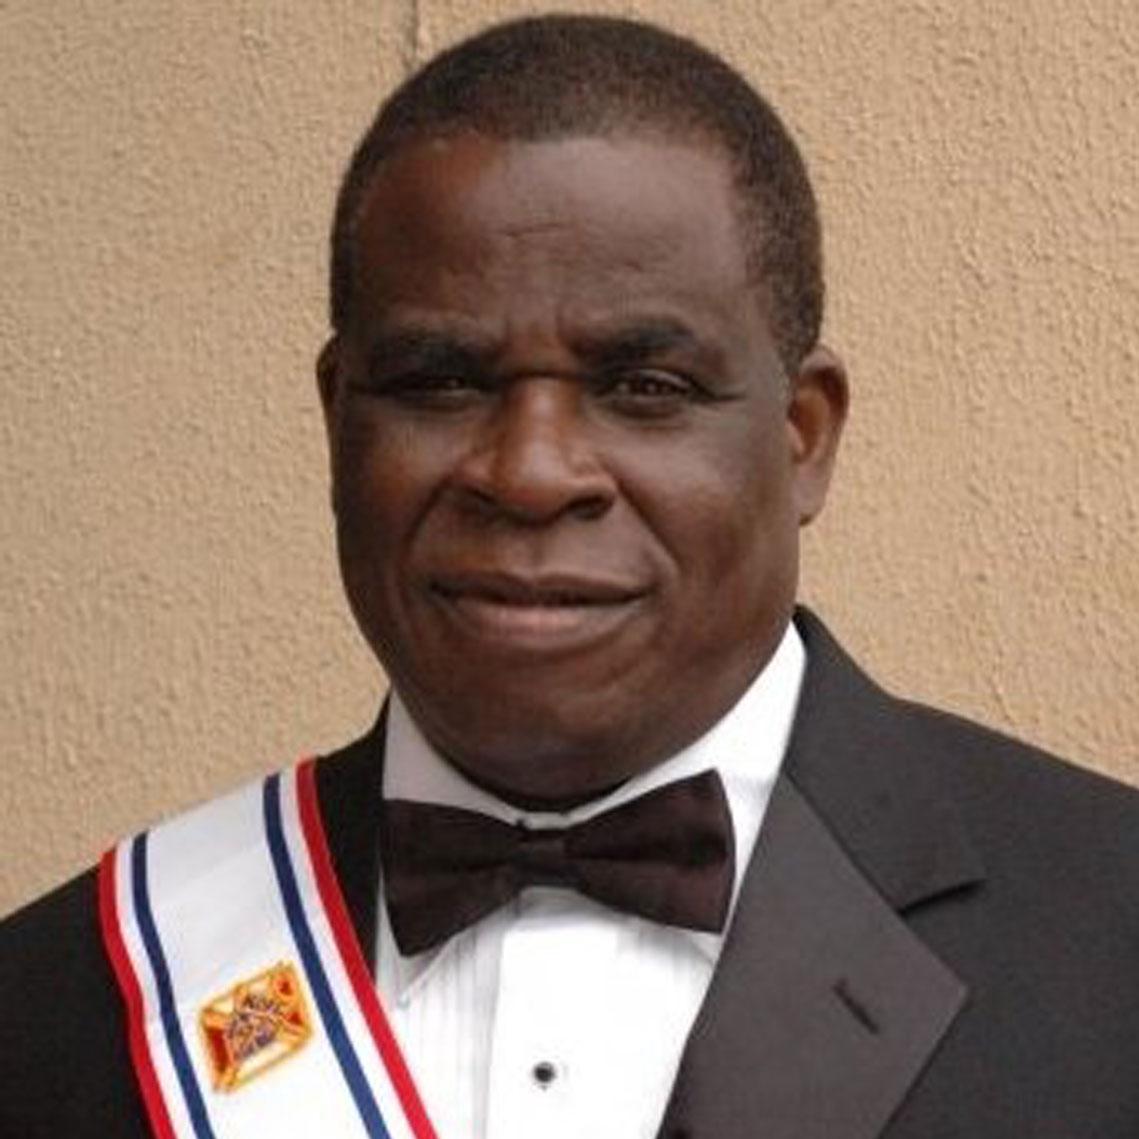 Victor Osagie Aimiuwu, PhD '76